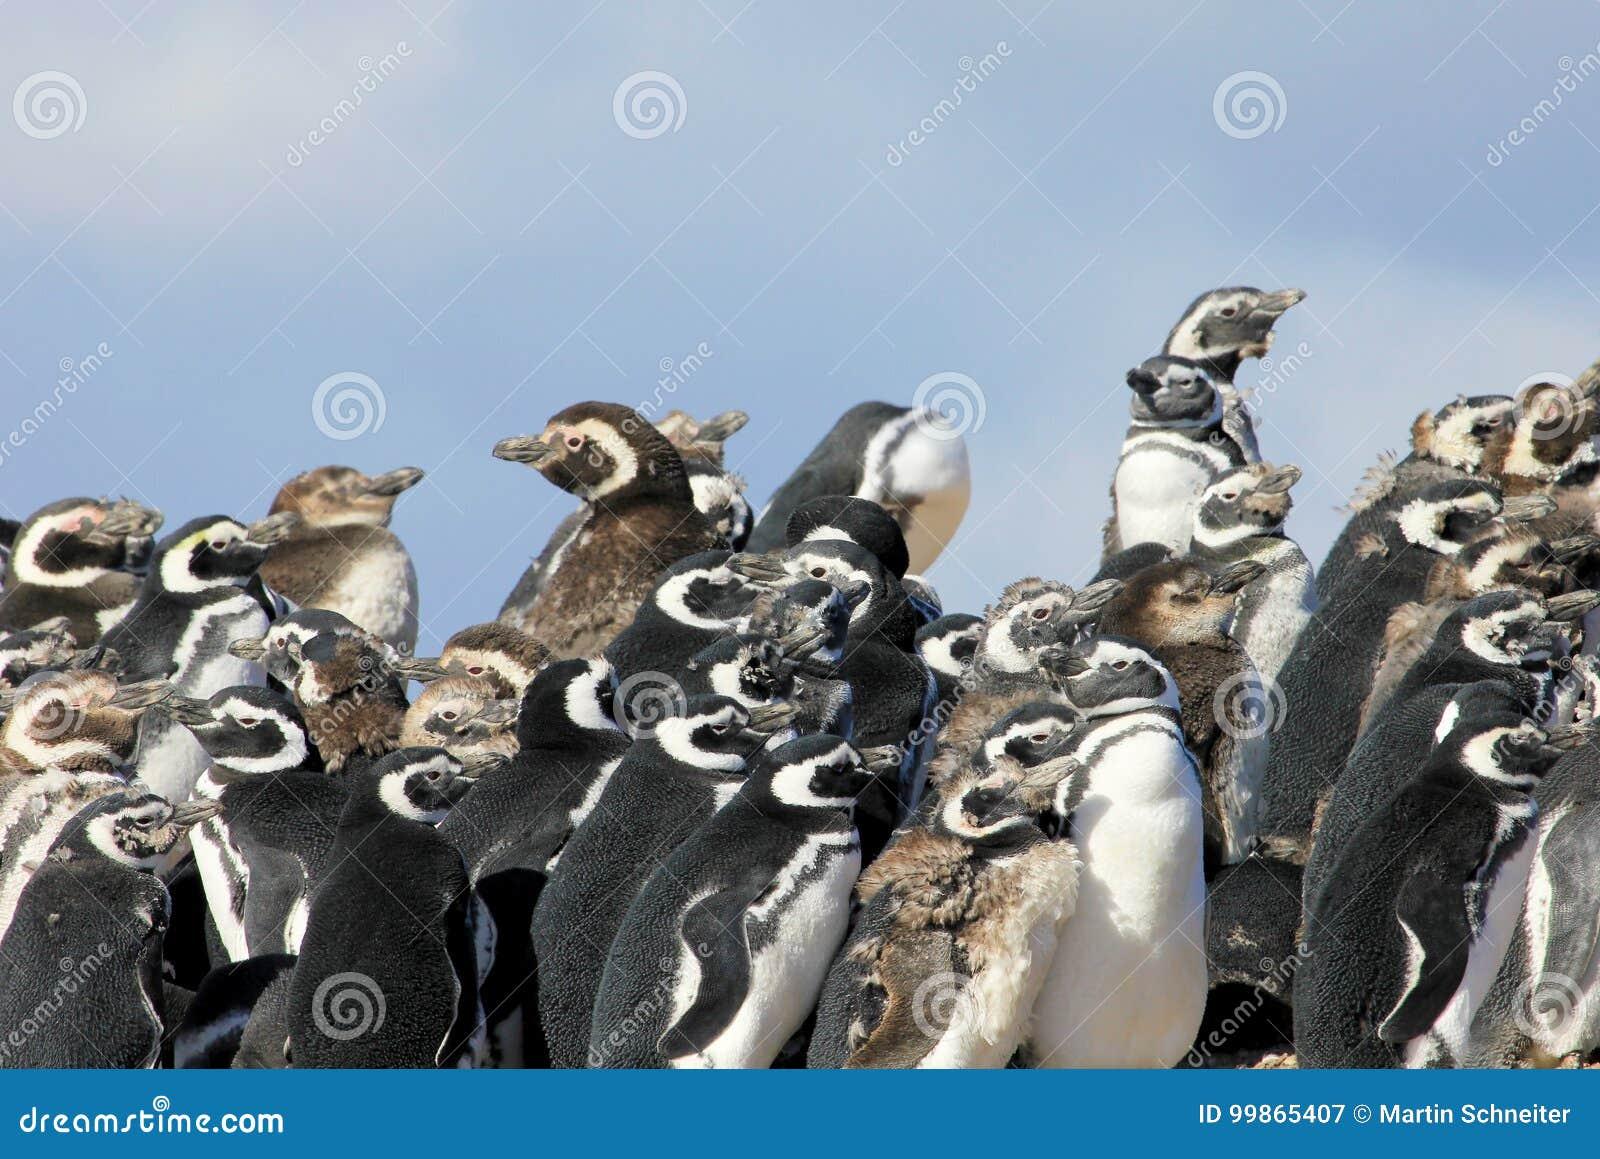 Gruppo del pinguino di Magellanic, magellanicus dello spheniscus, Falkland Islands